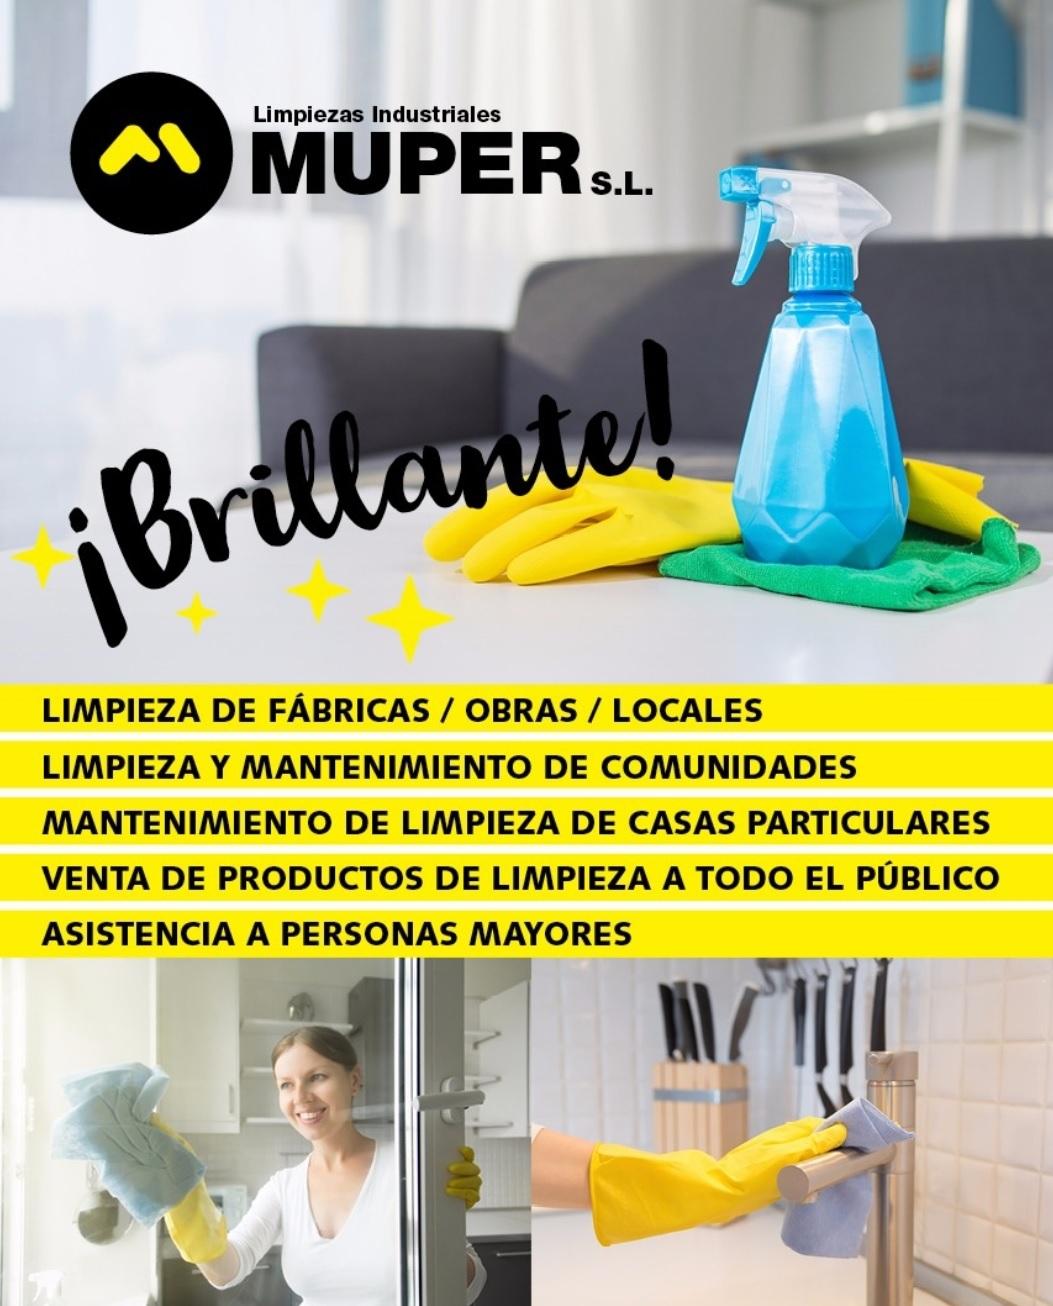 Limpiezas Industriales Muper S.L.